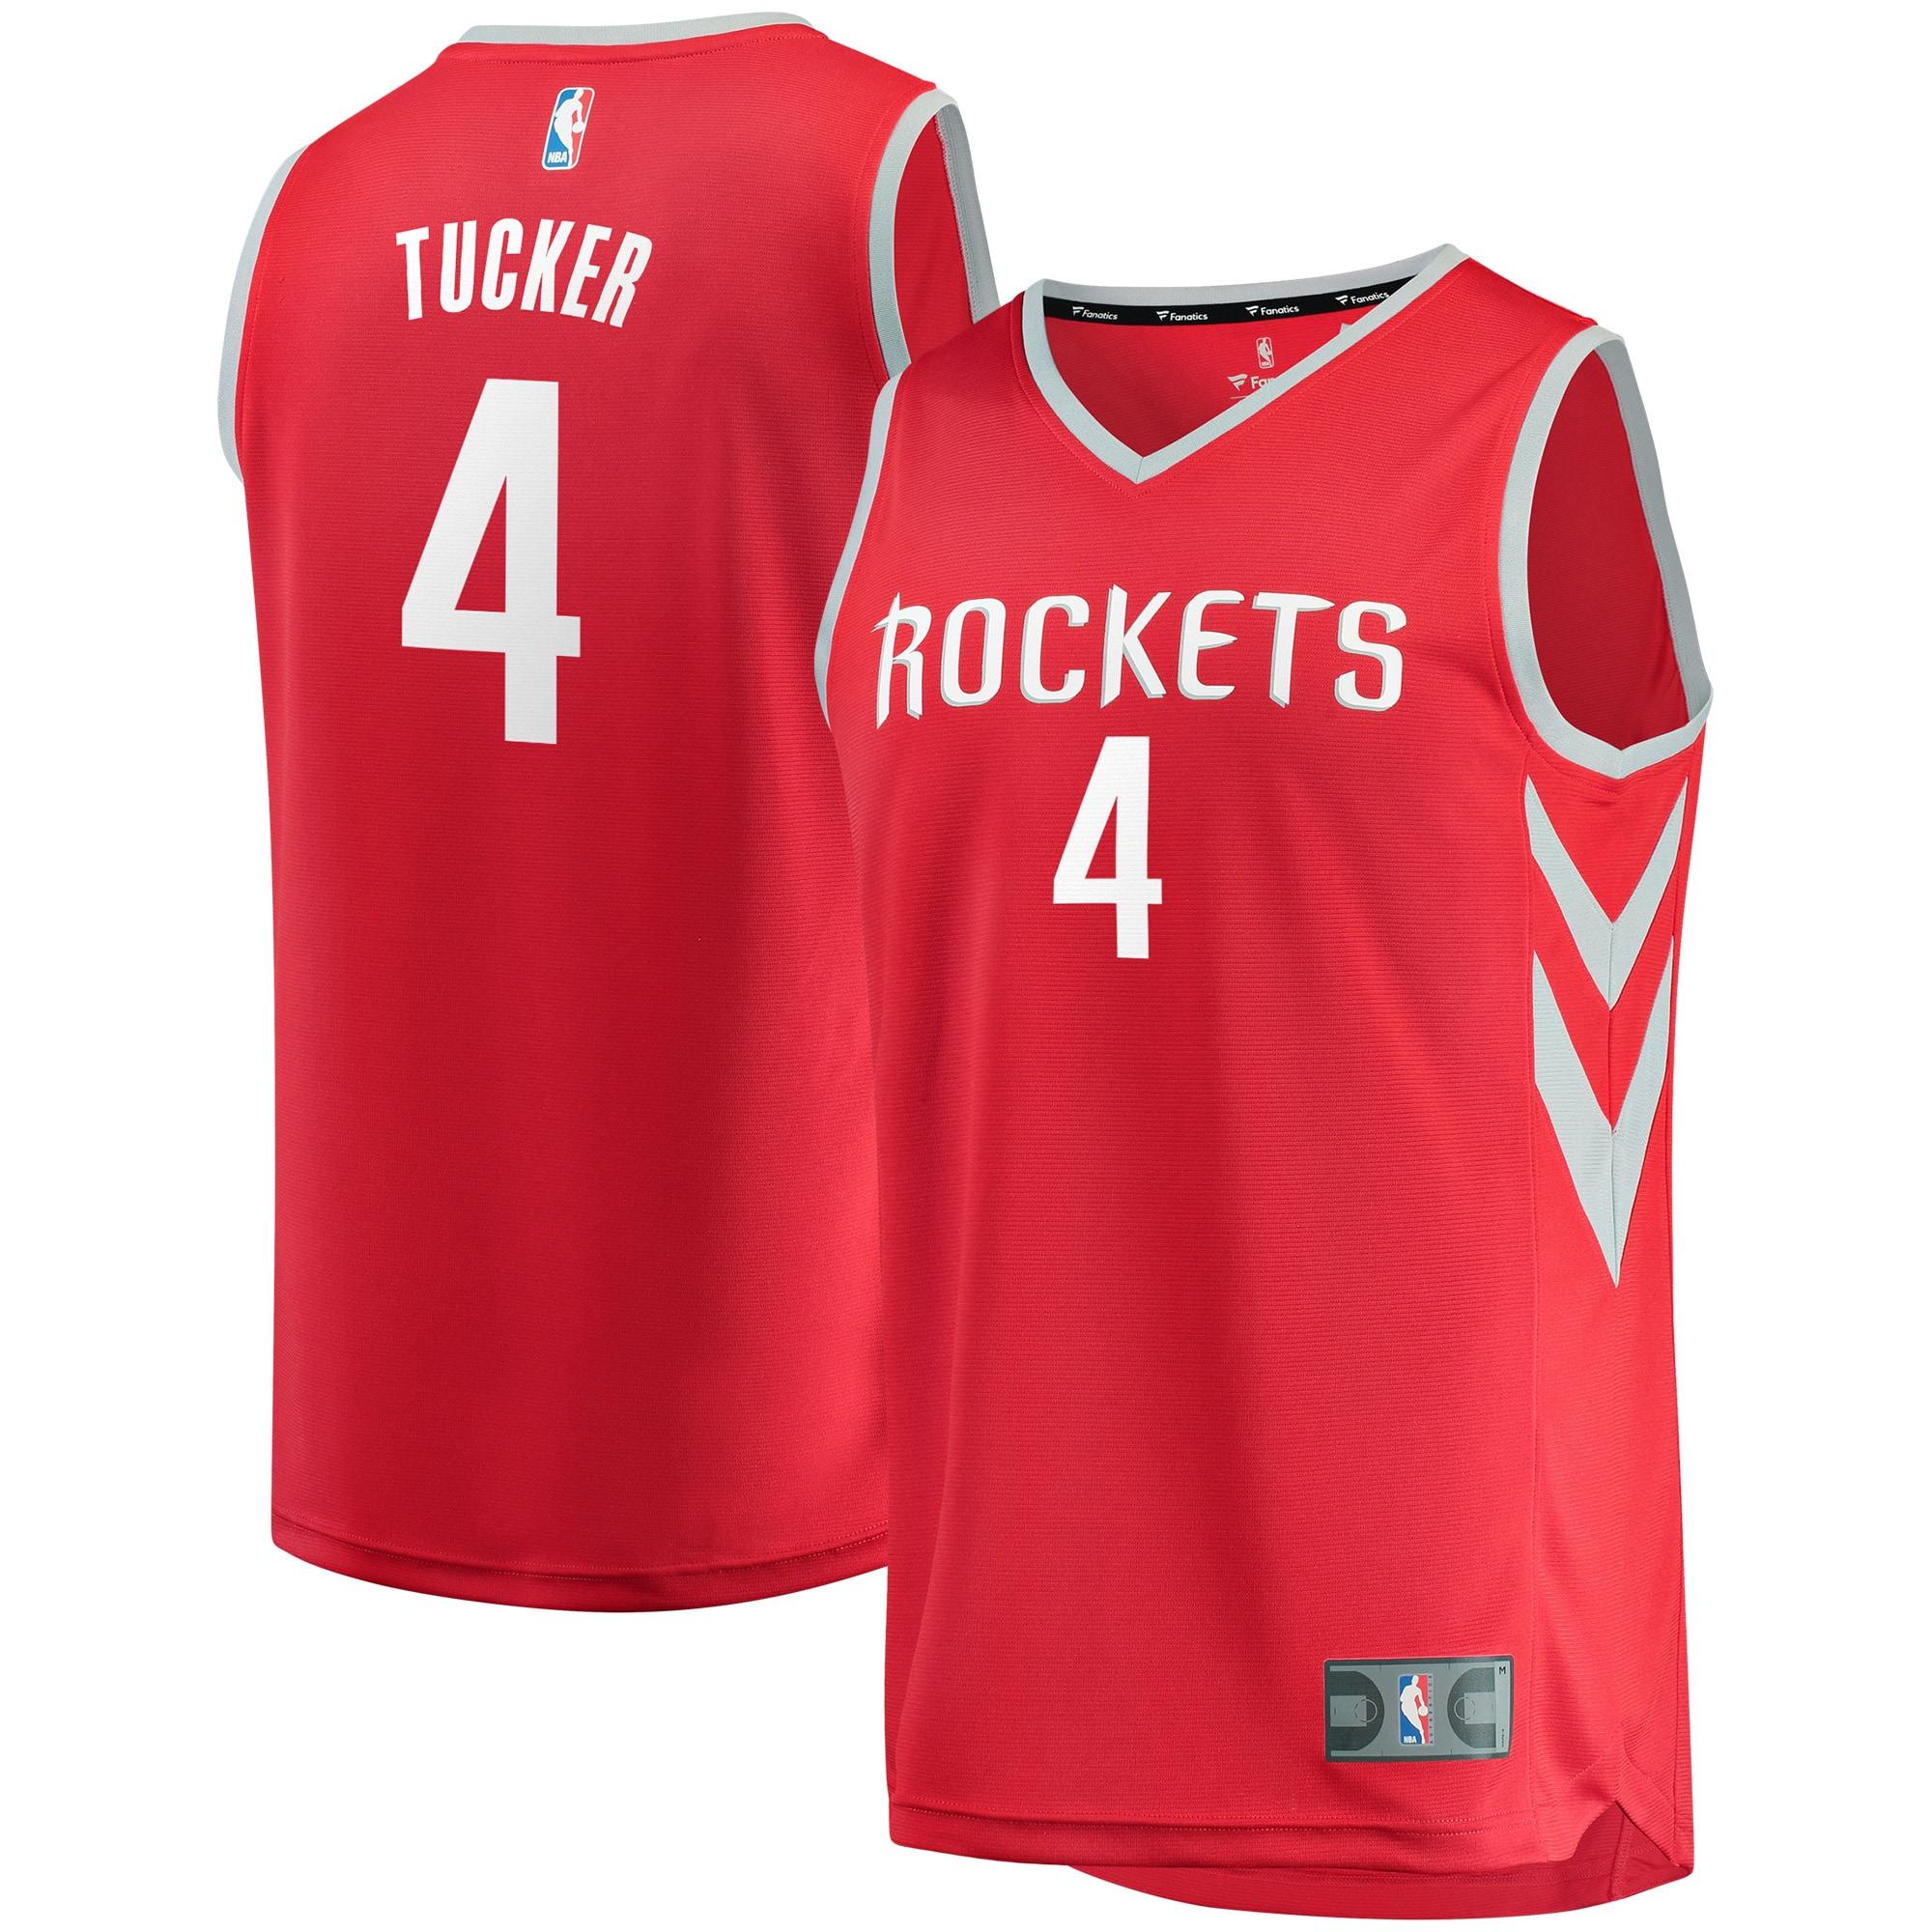 PJ Tucker Houston Rockets Fanatics Branded Youth Fast Break Player Jersey - Icon Edition - Red